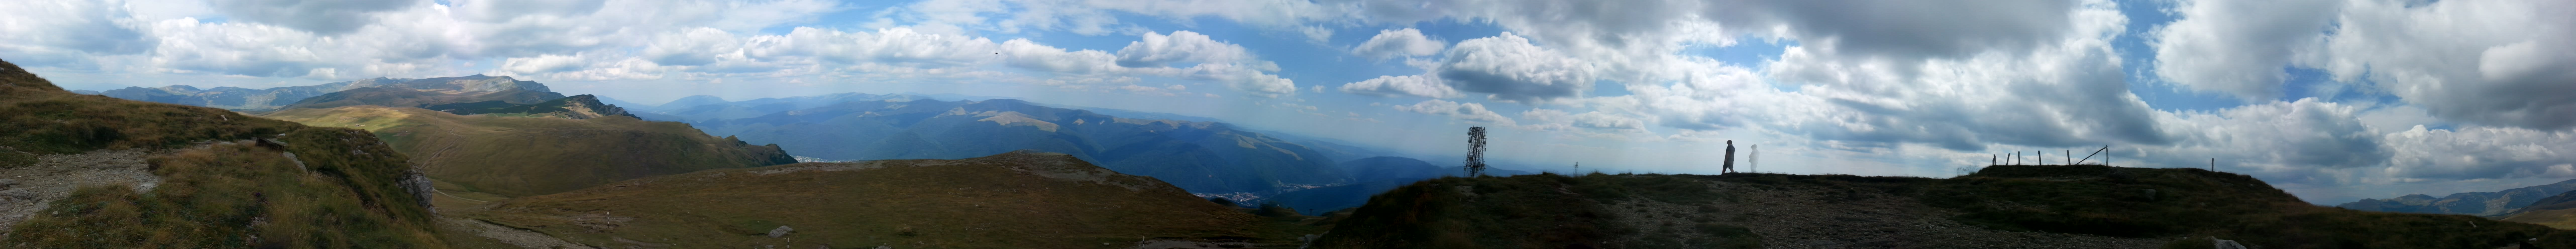 panorama-spre-valea-prahovei-de-la-cota-2000